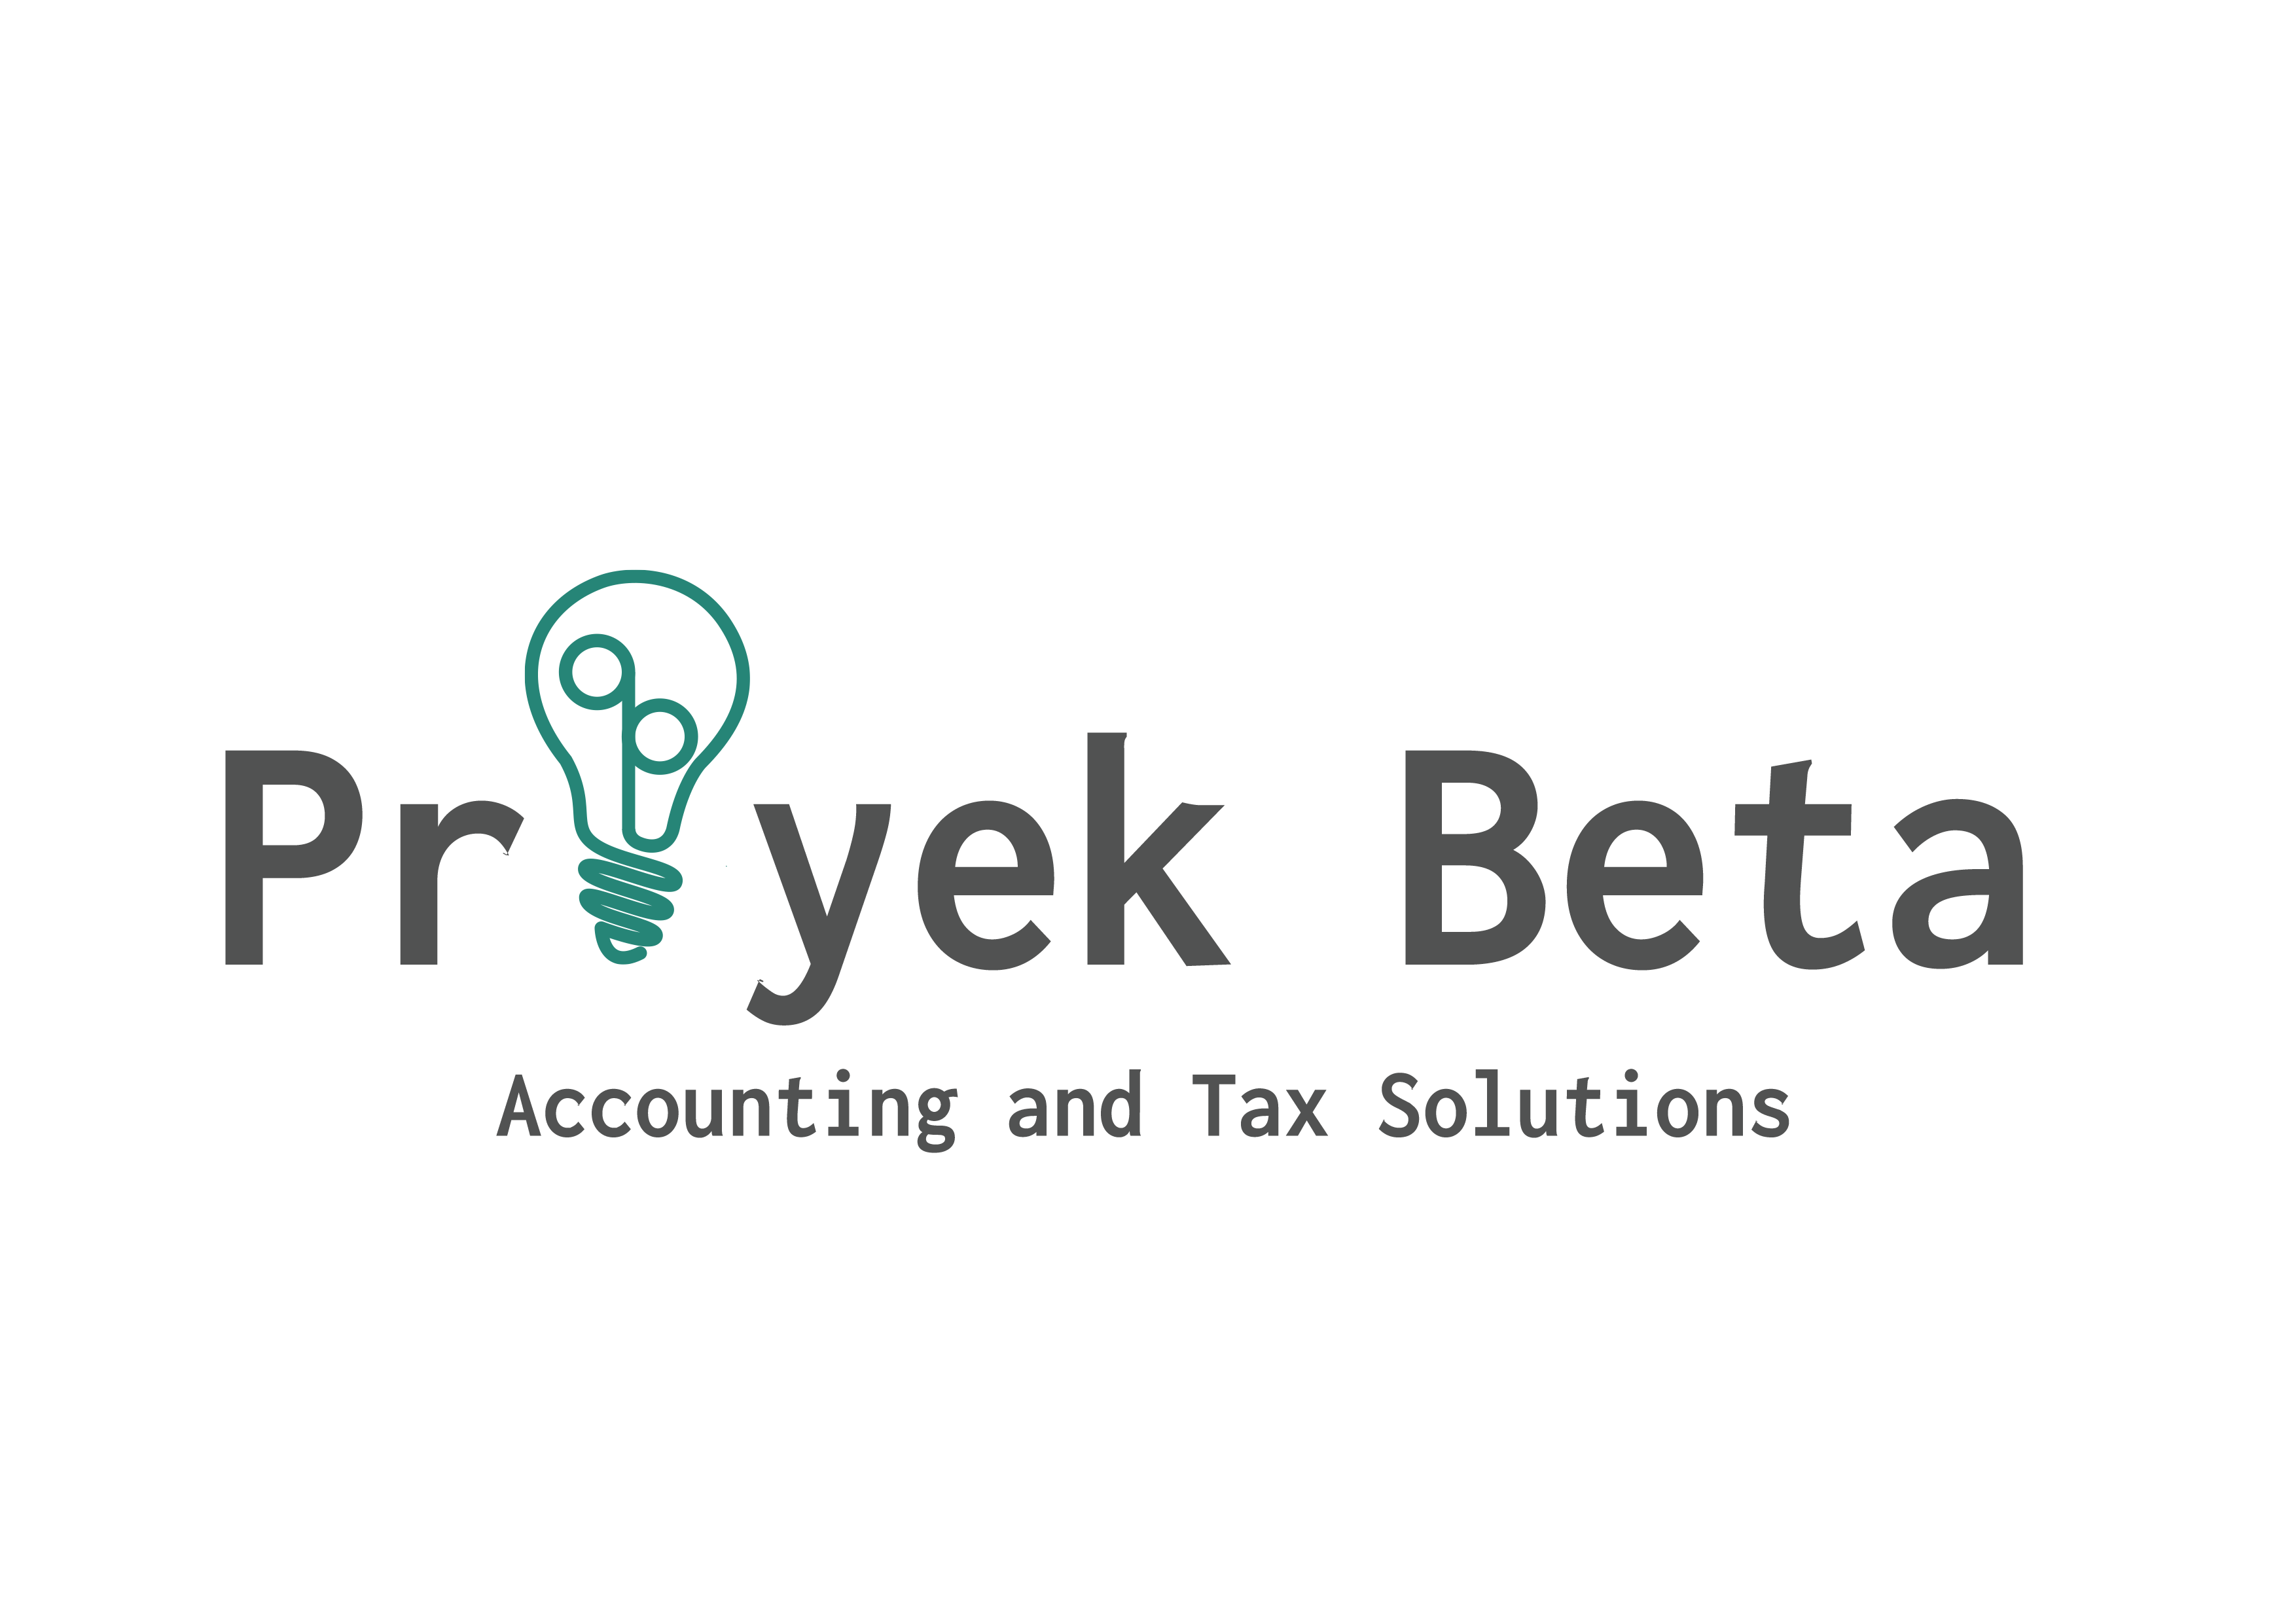 Proyek Beta